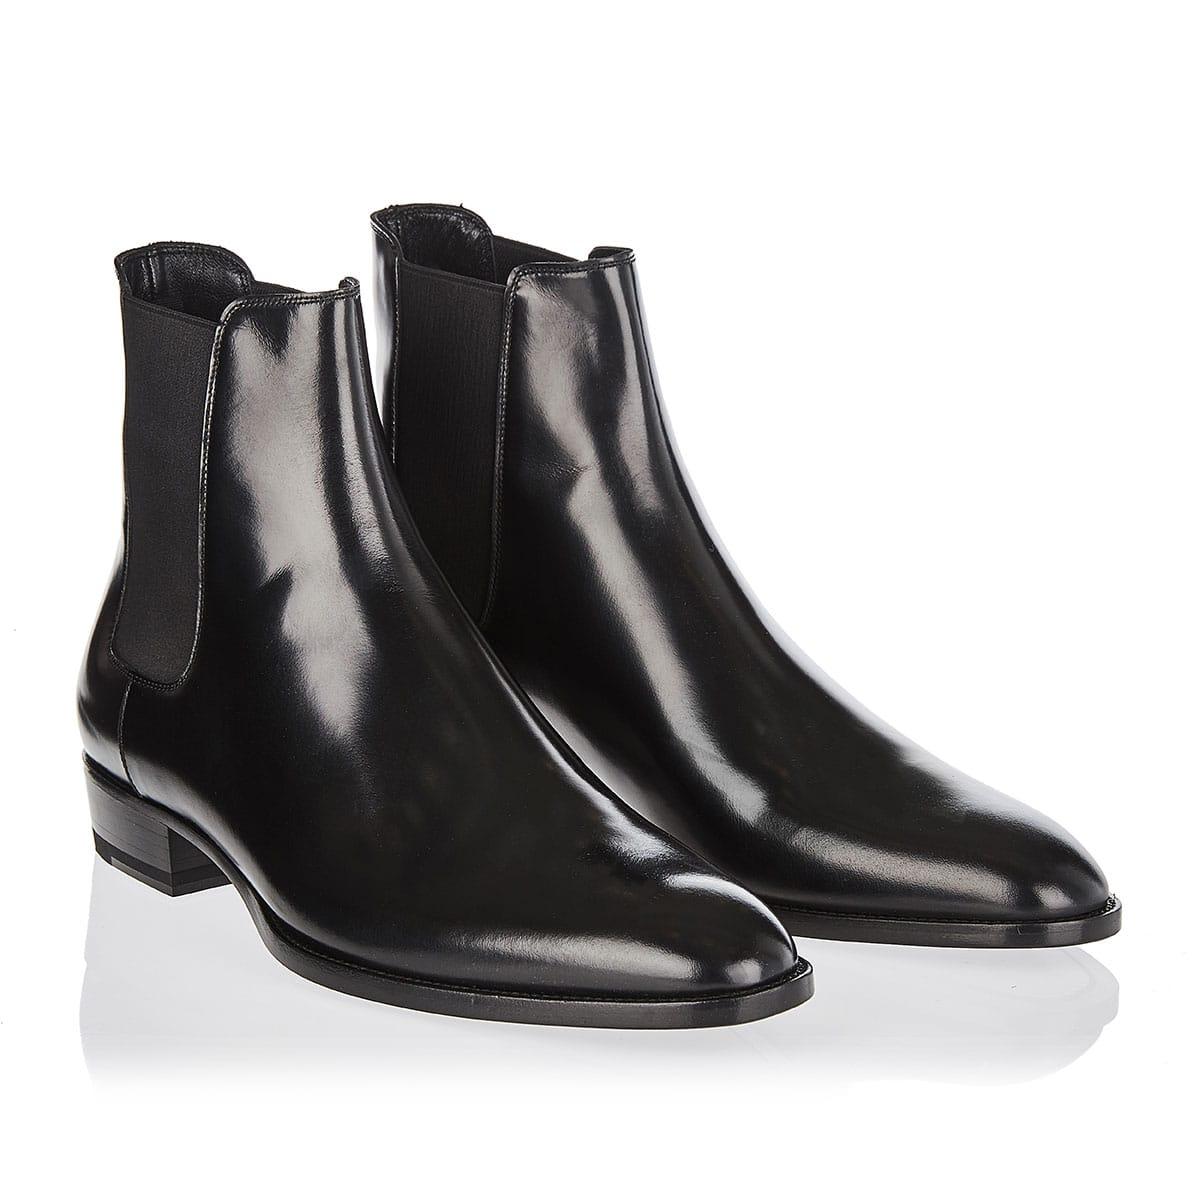 Wyatt leather chelsea boots